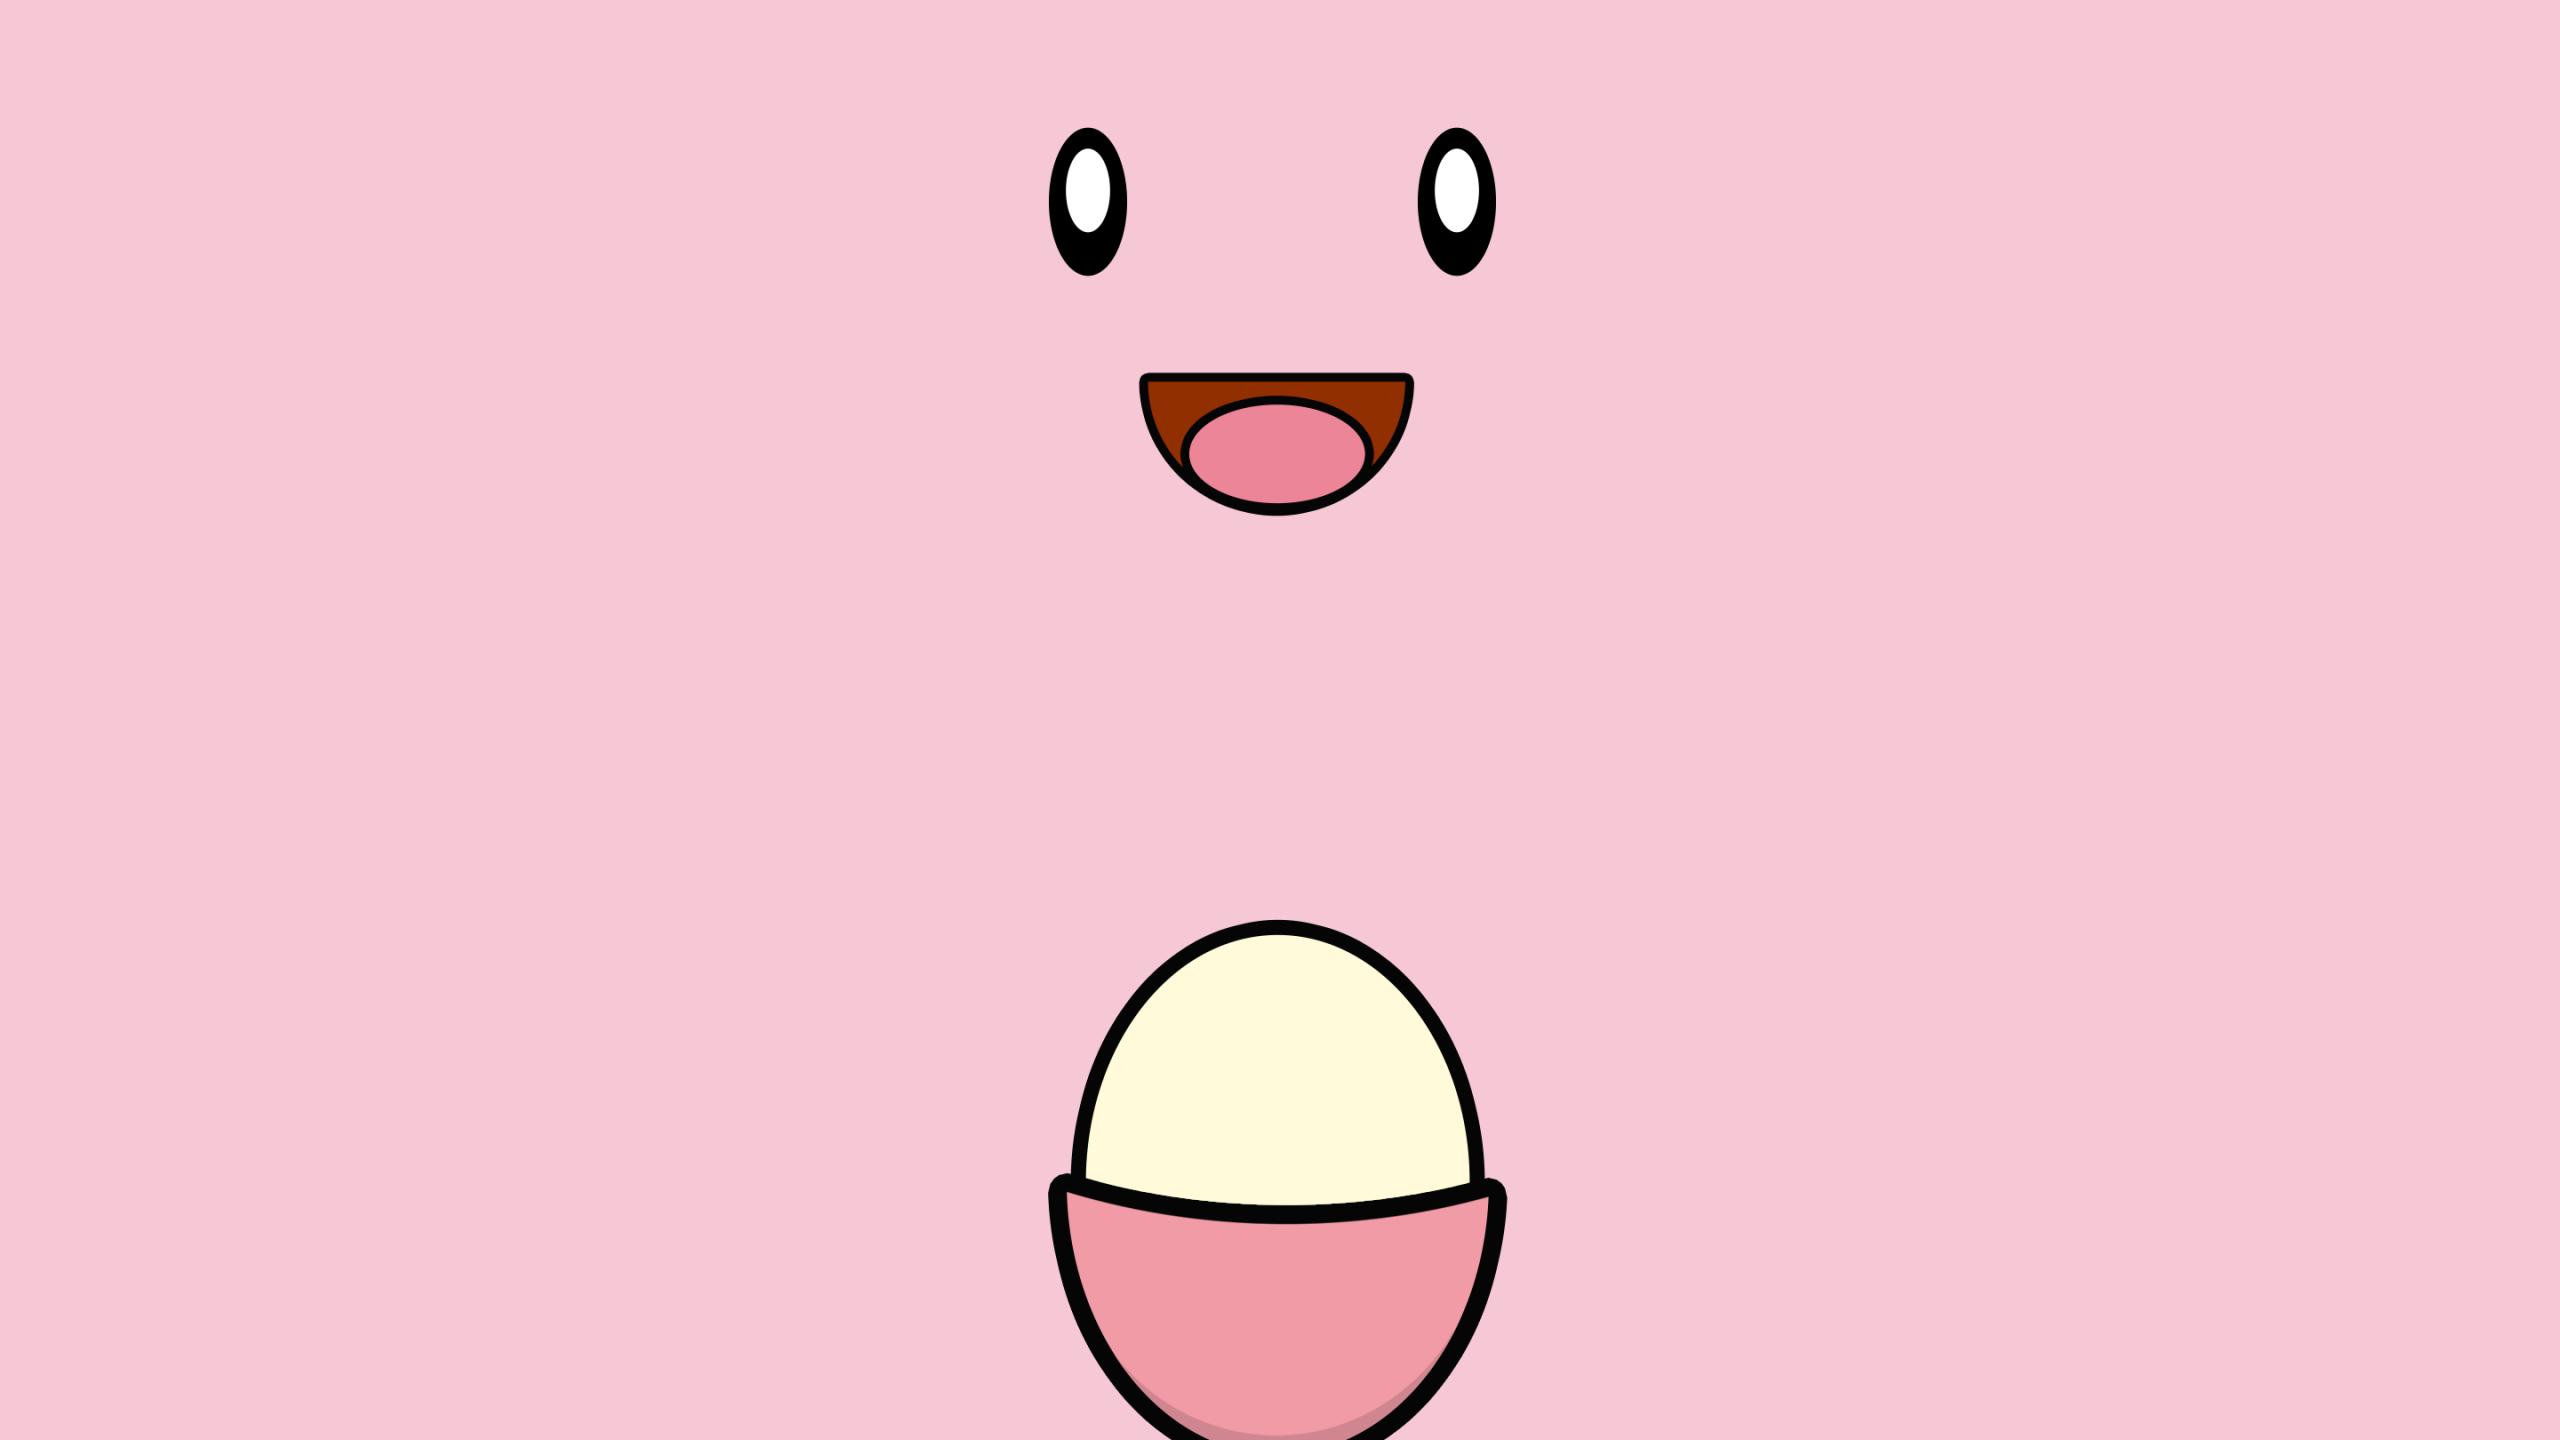 Best Wallpaper Of Chansey From Pokemon PaperPull 2560x1440